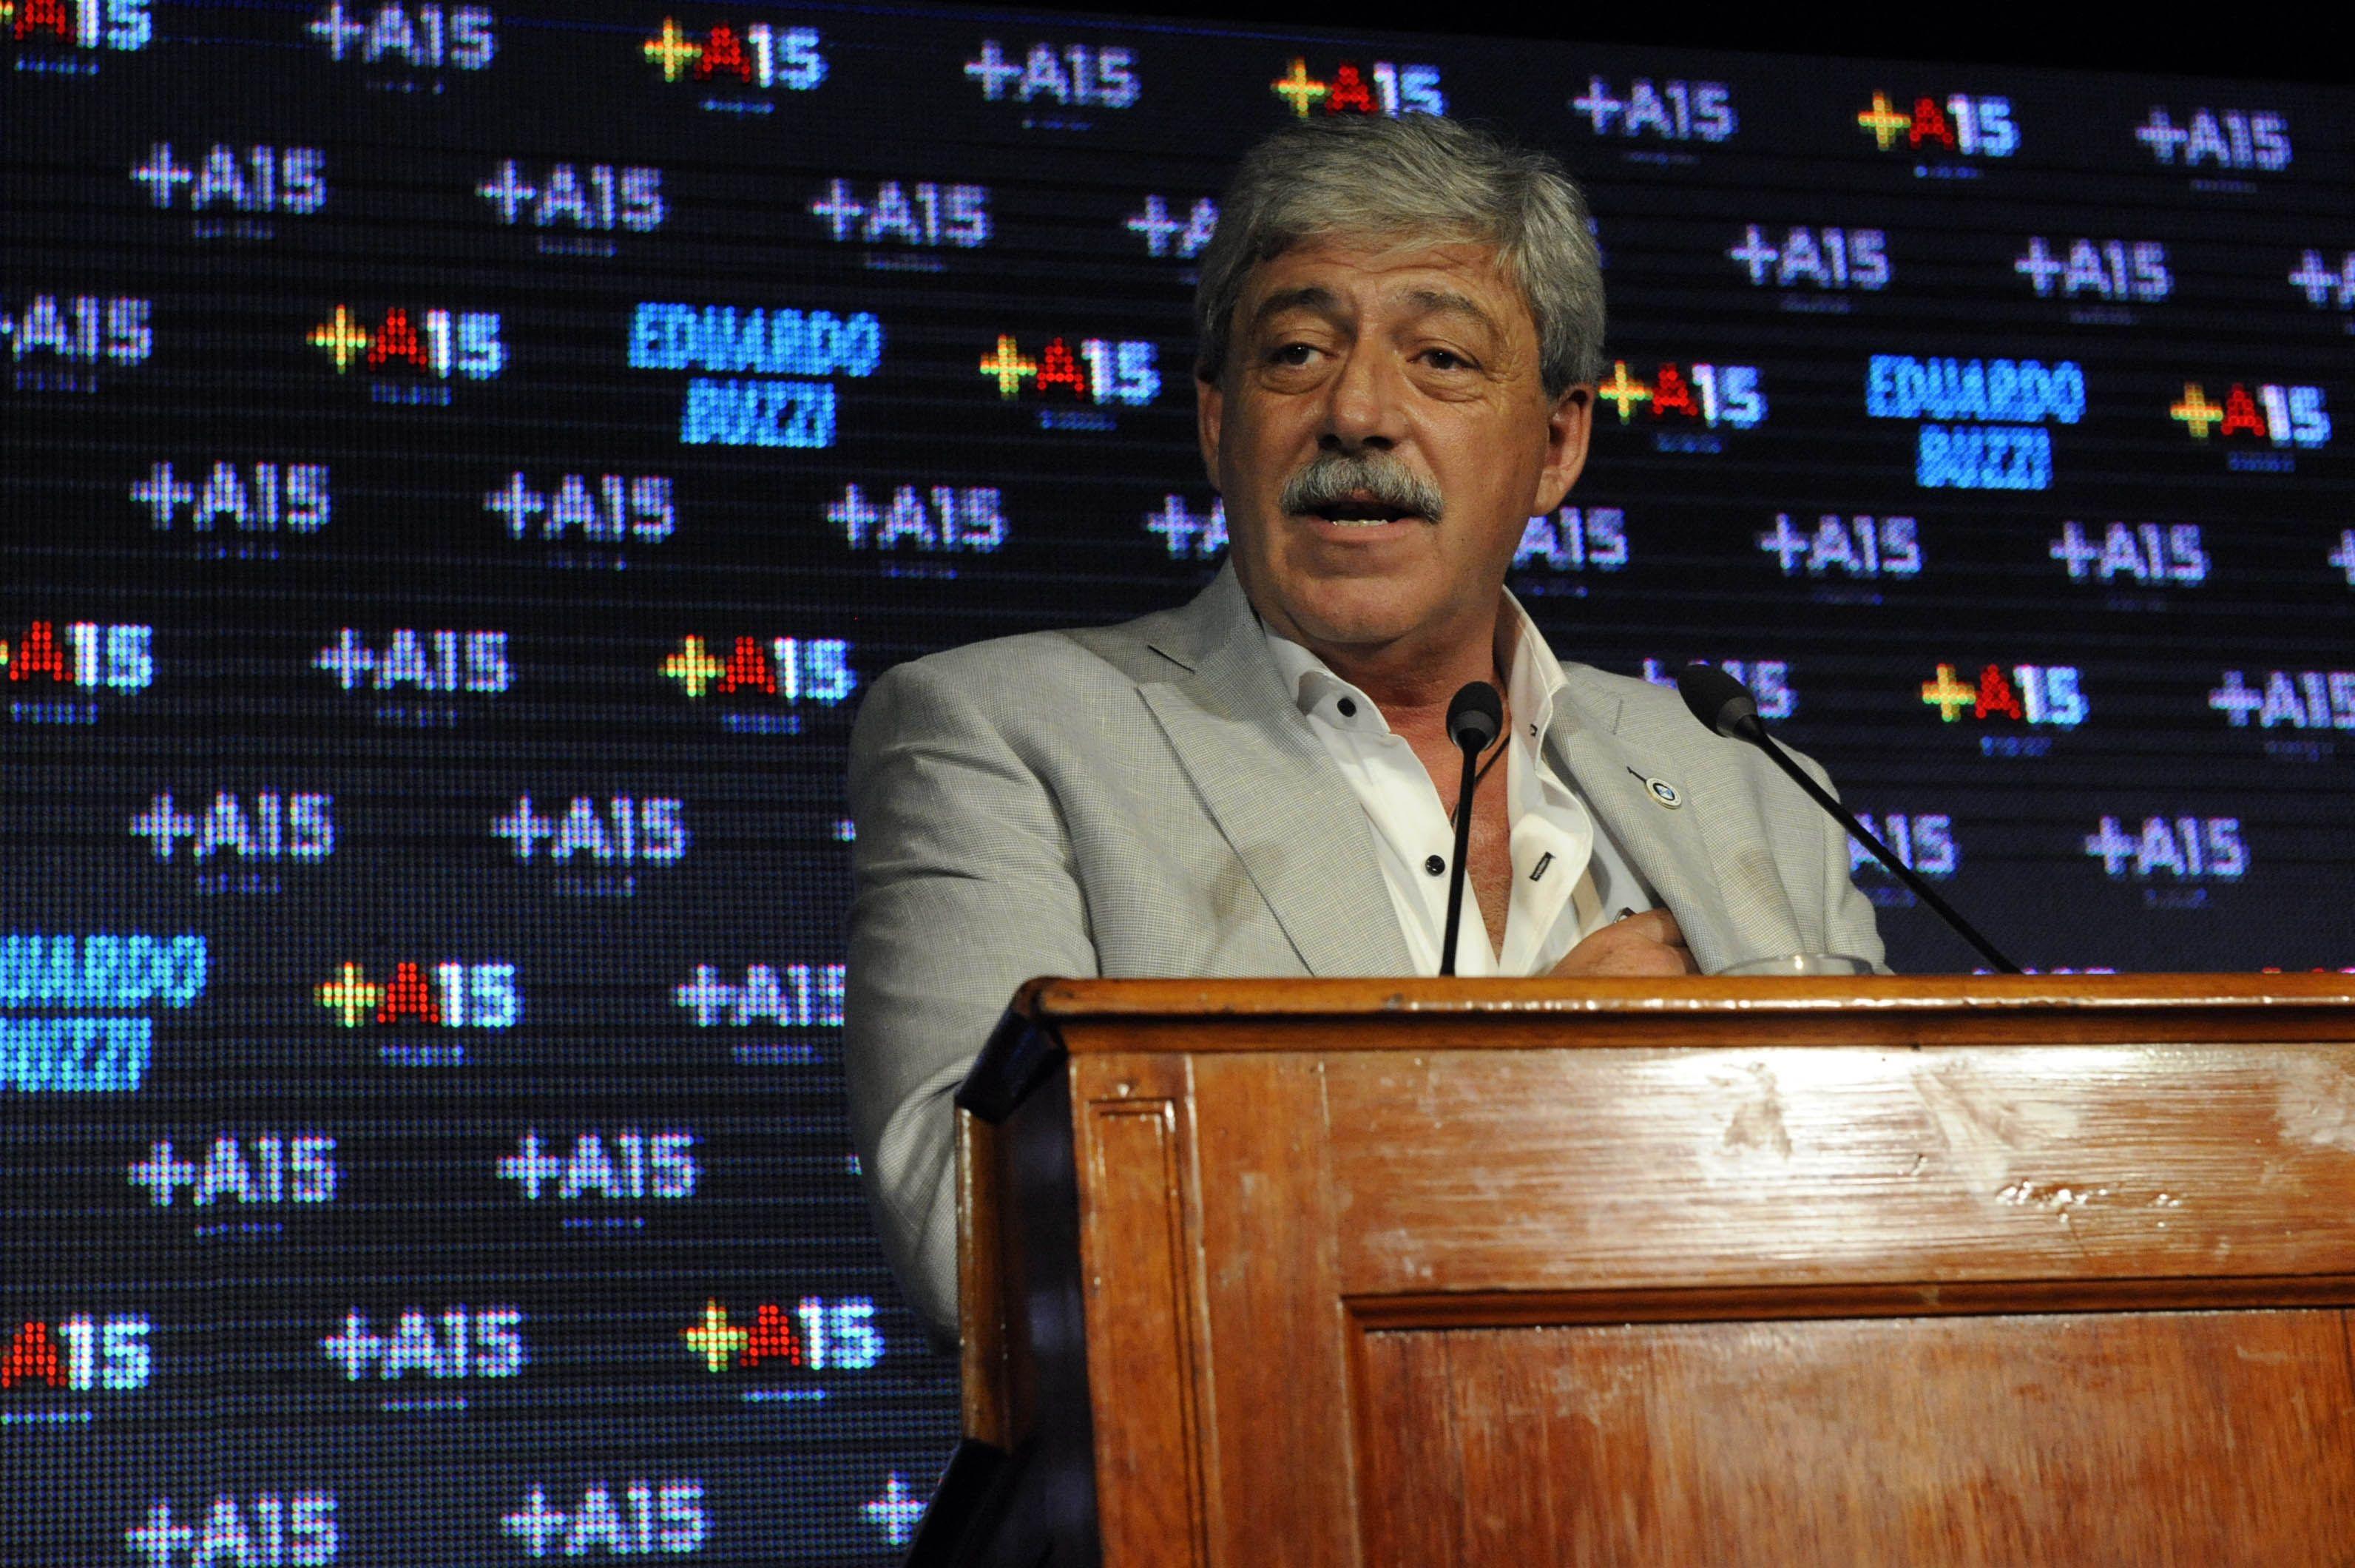 El ex titular de Federación Agraria disparó munición gruesa contra el anunció de la presidenta Cristina Fernánde de Kirchner.